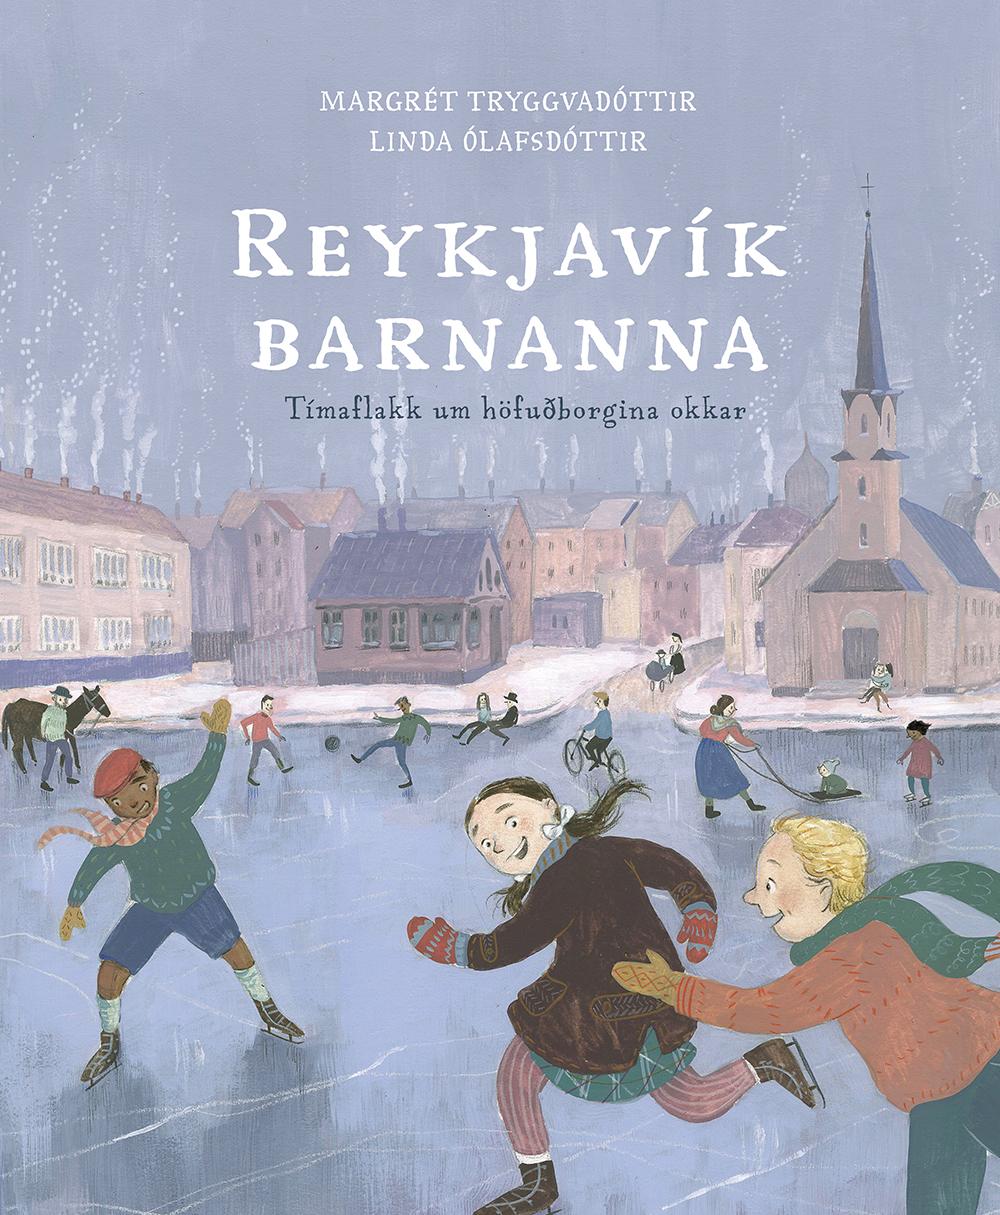 Reykjavík barnanna